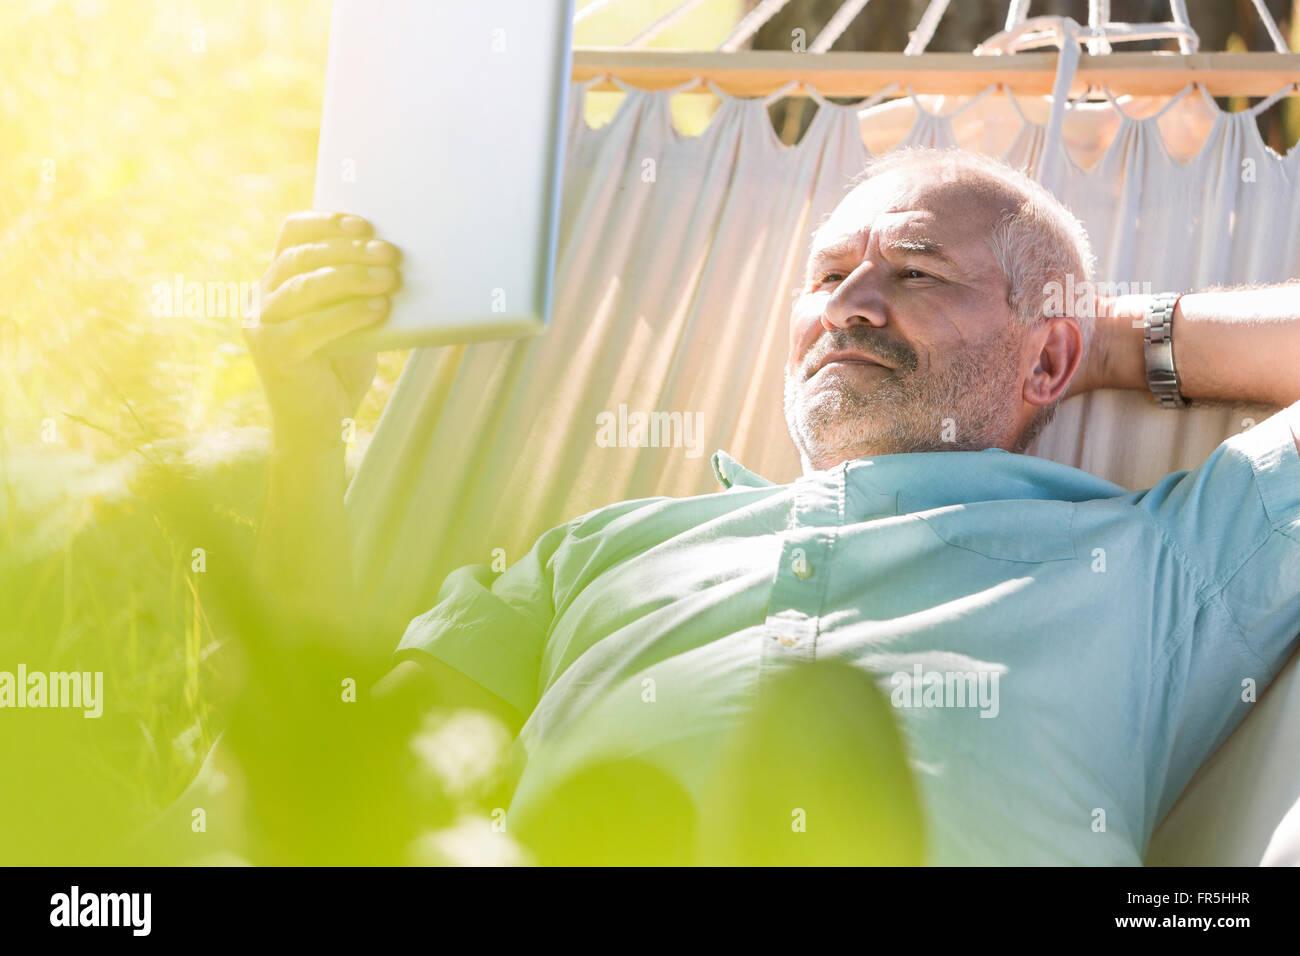 Senior man using digital tablet and relaxing in summer hammock - Stock Image